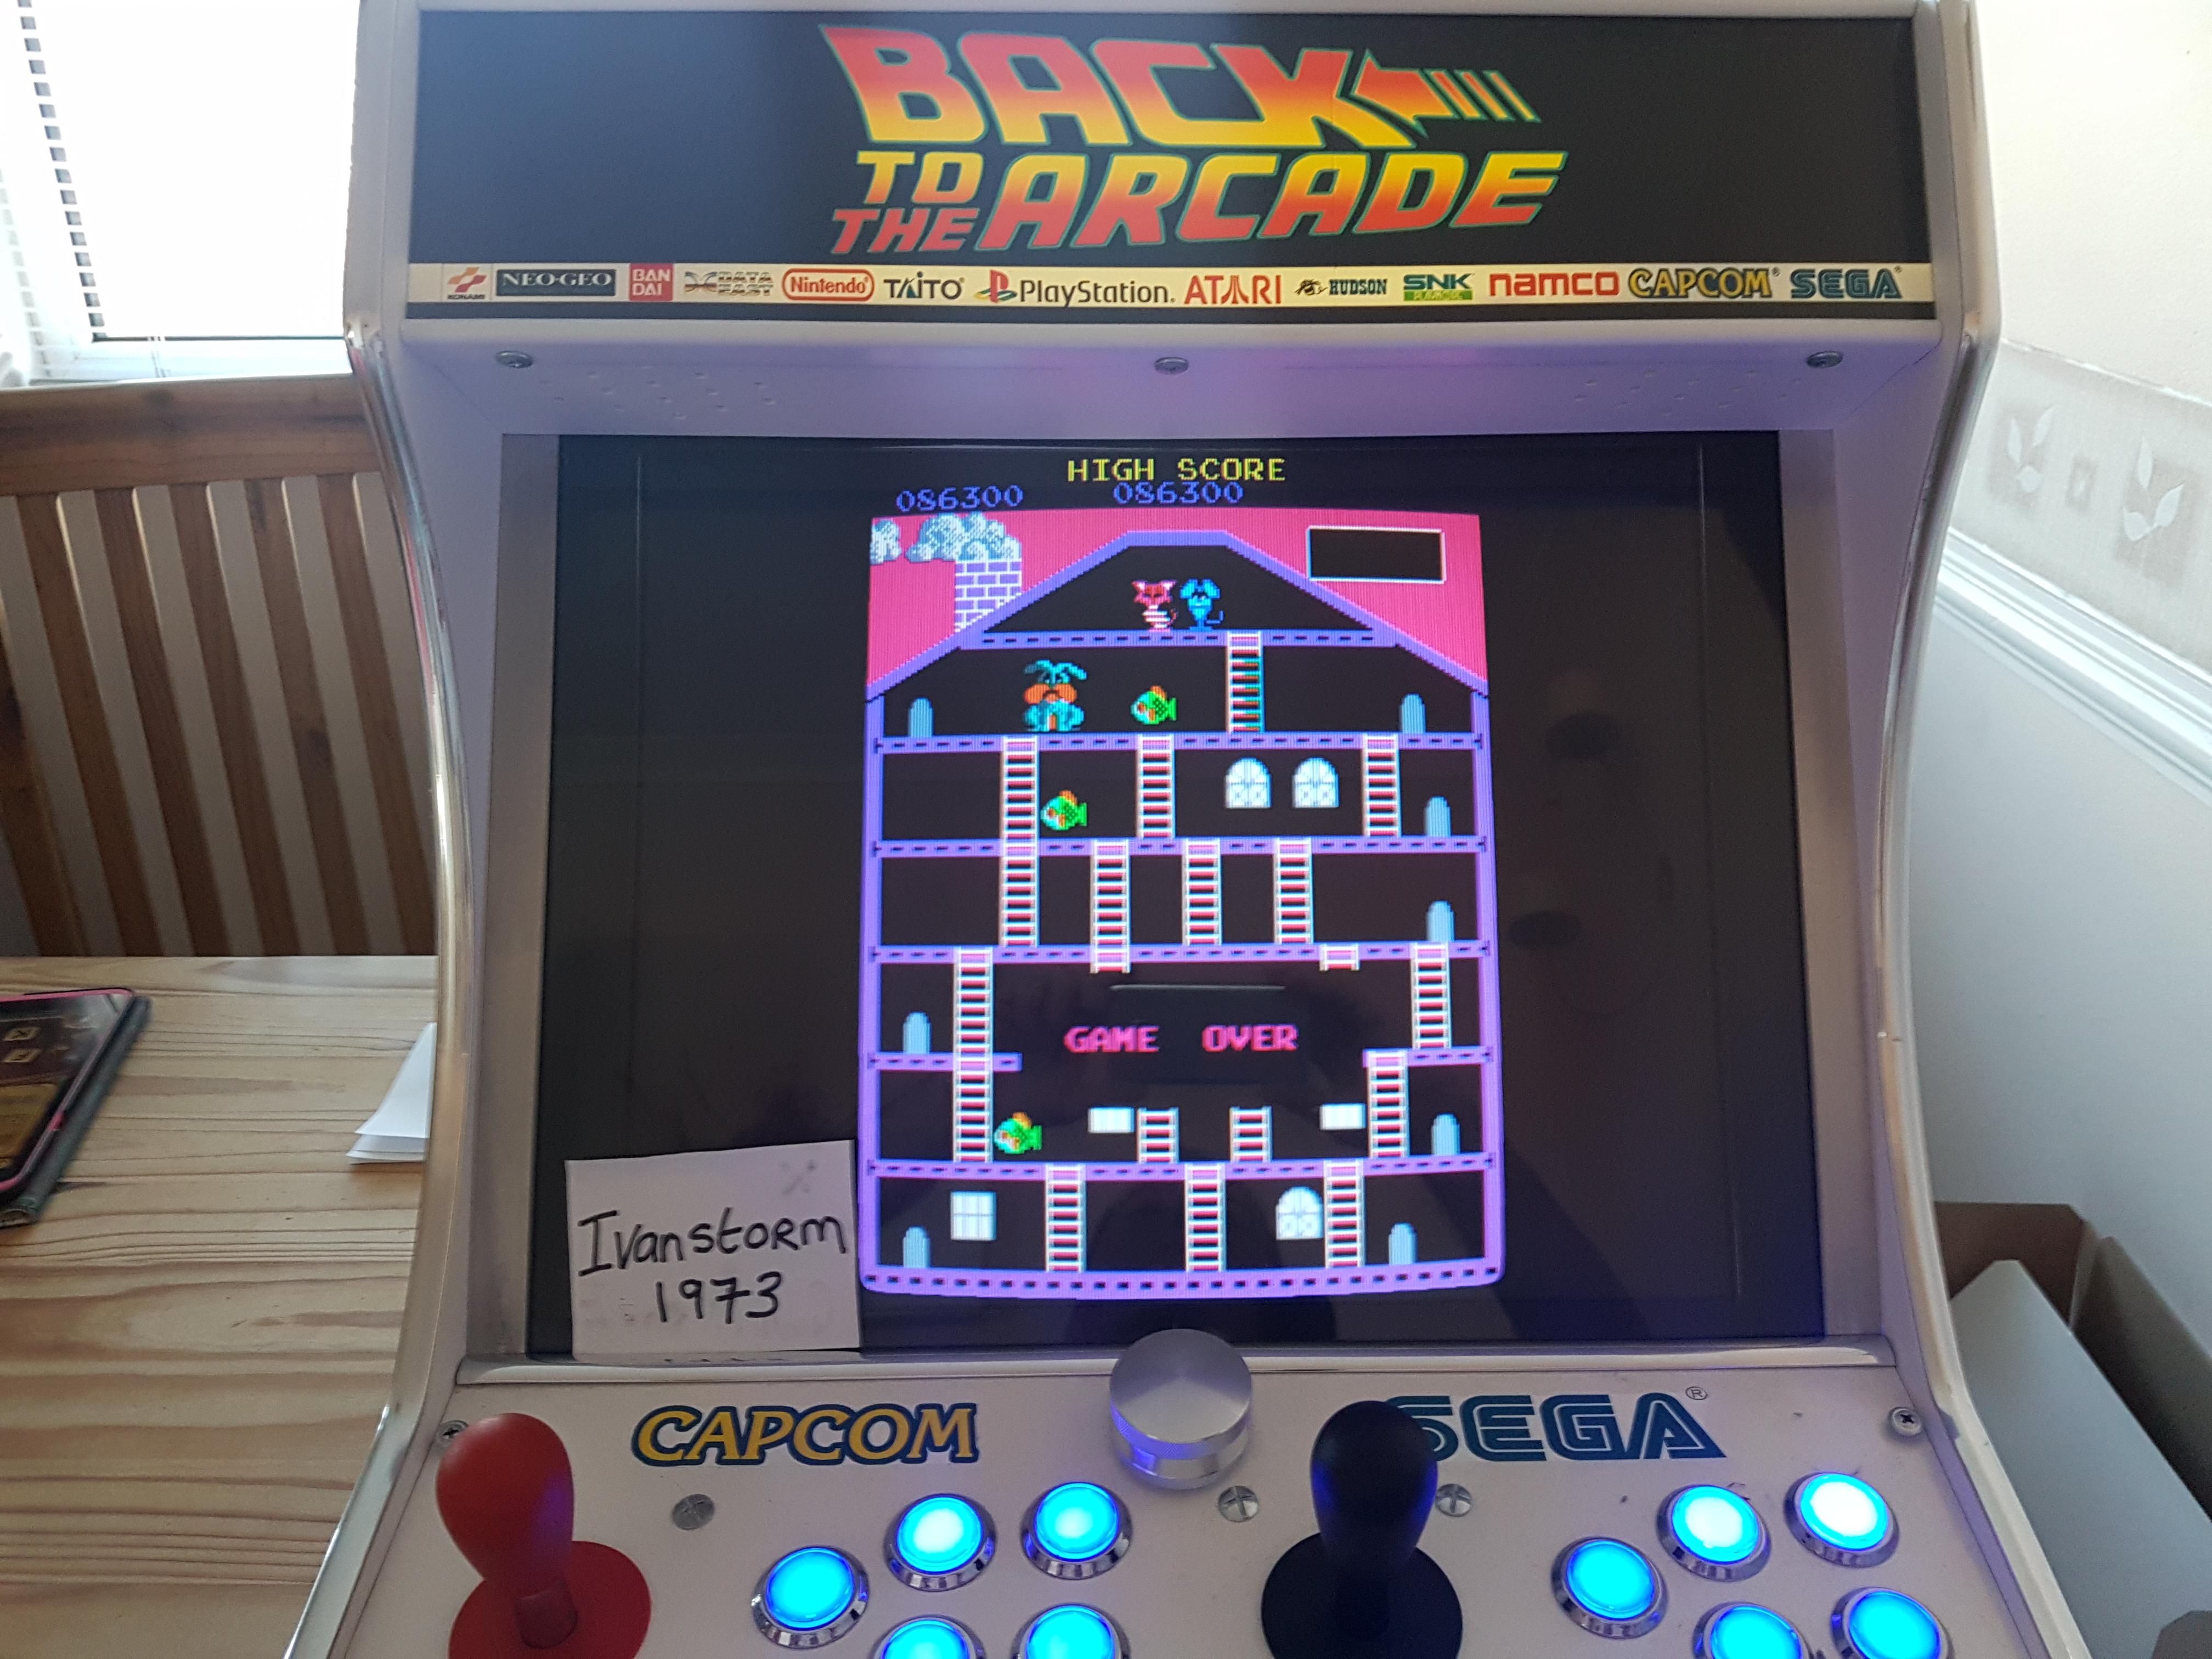 Ivanstorm1973: Mouser [mouser] (Arcade Emulated / M.A.M.E.) 86,300 points on 2018-02-01 07:01:05